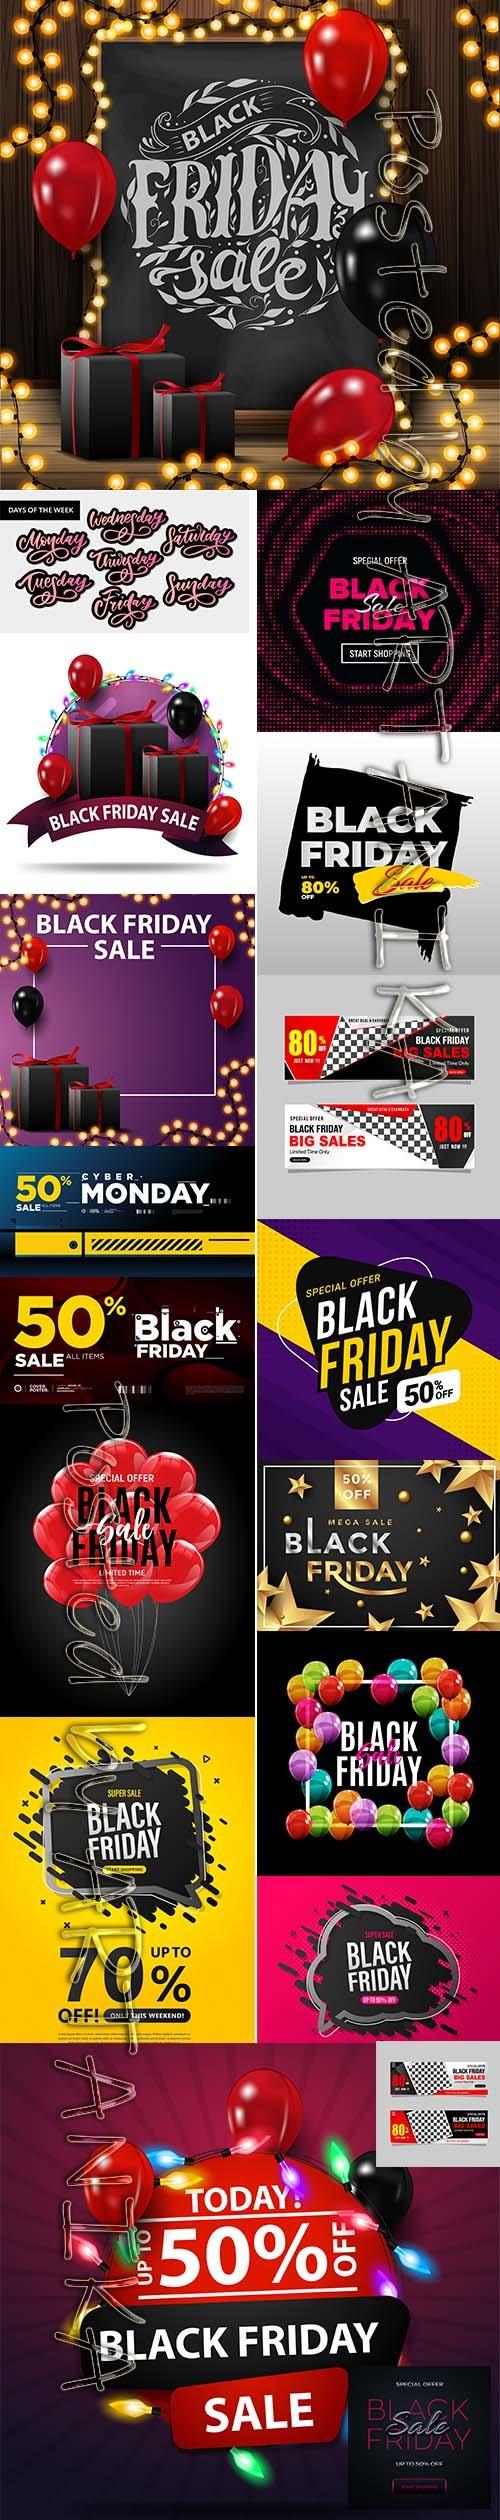 Black Friday Sale Backgrounds Vol 2